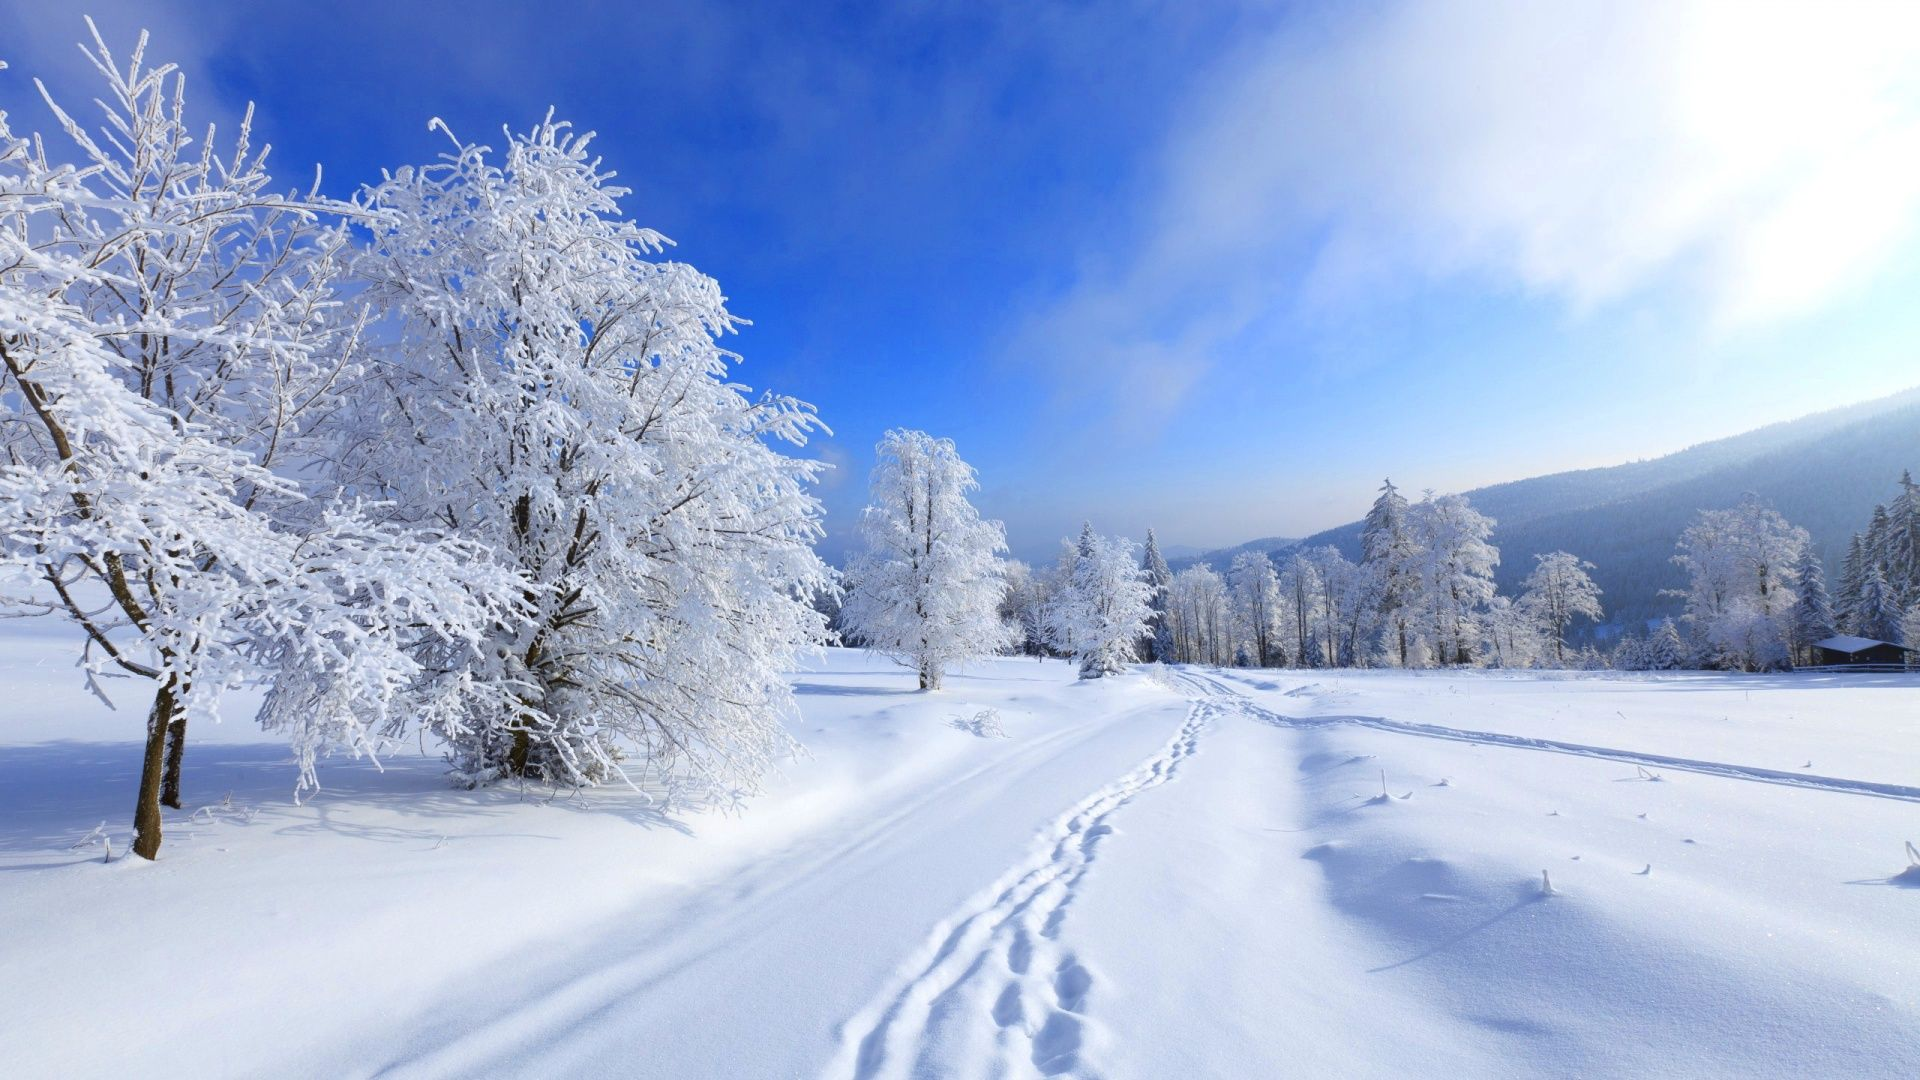 Free Desktop Winter Wallpaper Backgrounds 1440×900 Winter